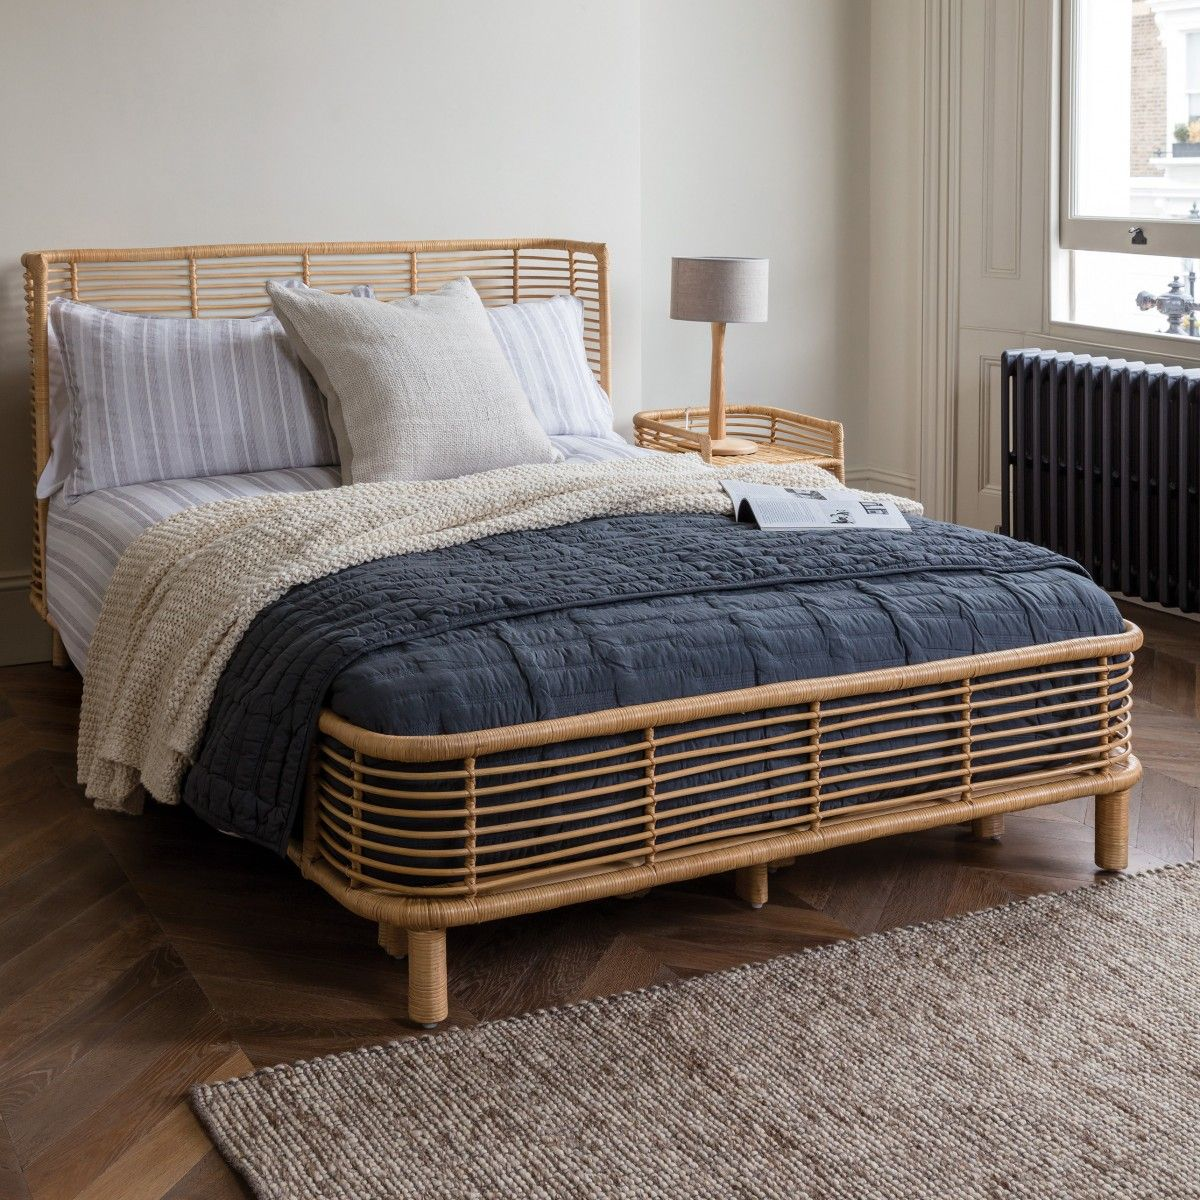 Rattan Yatak Trysil Luroy Double Bed Brown Black 160x200 Cm Ikea